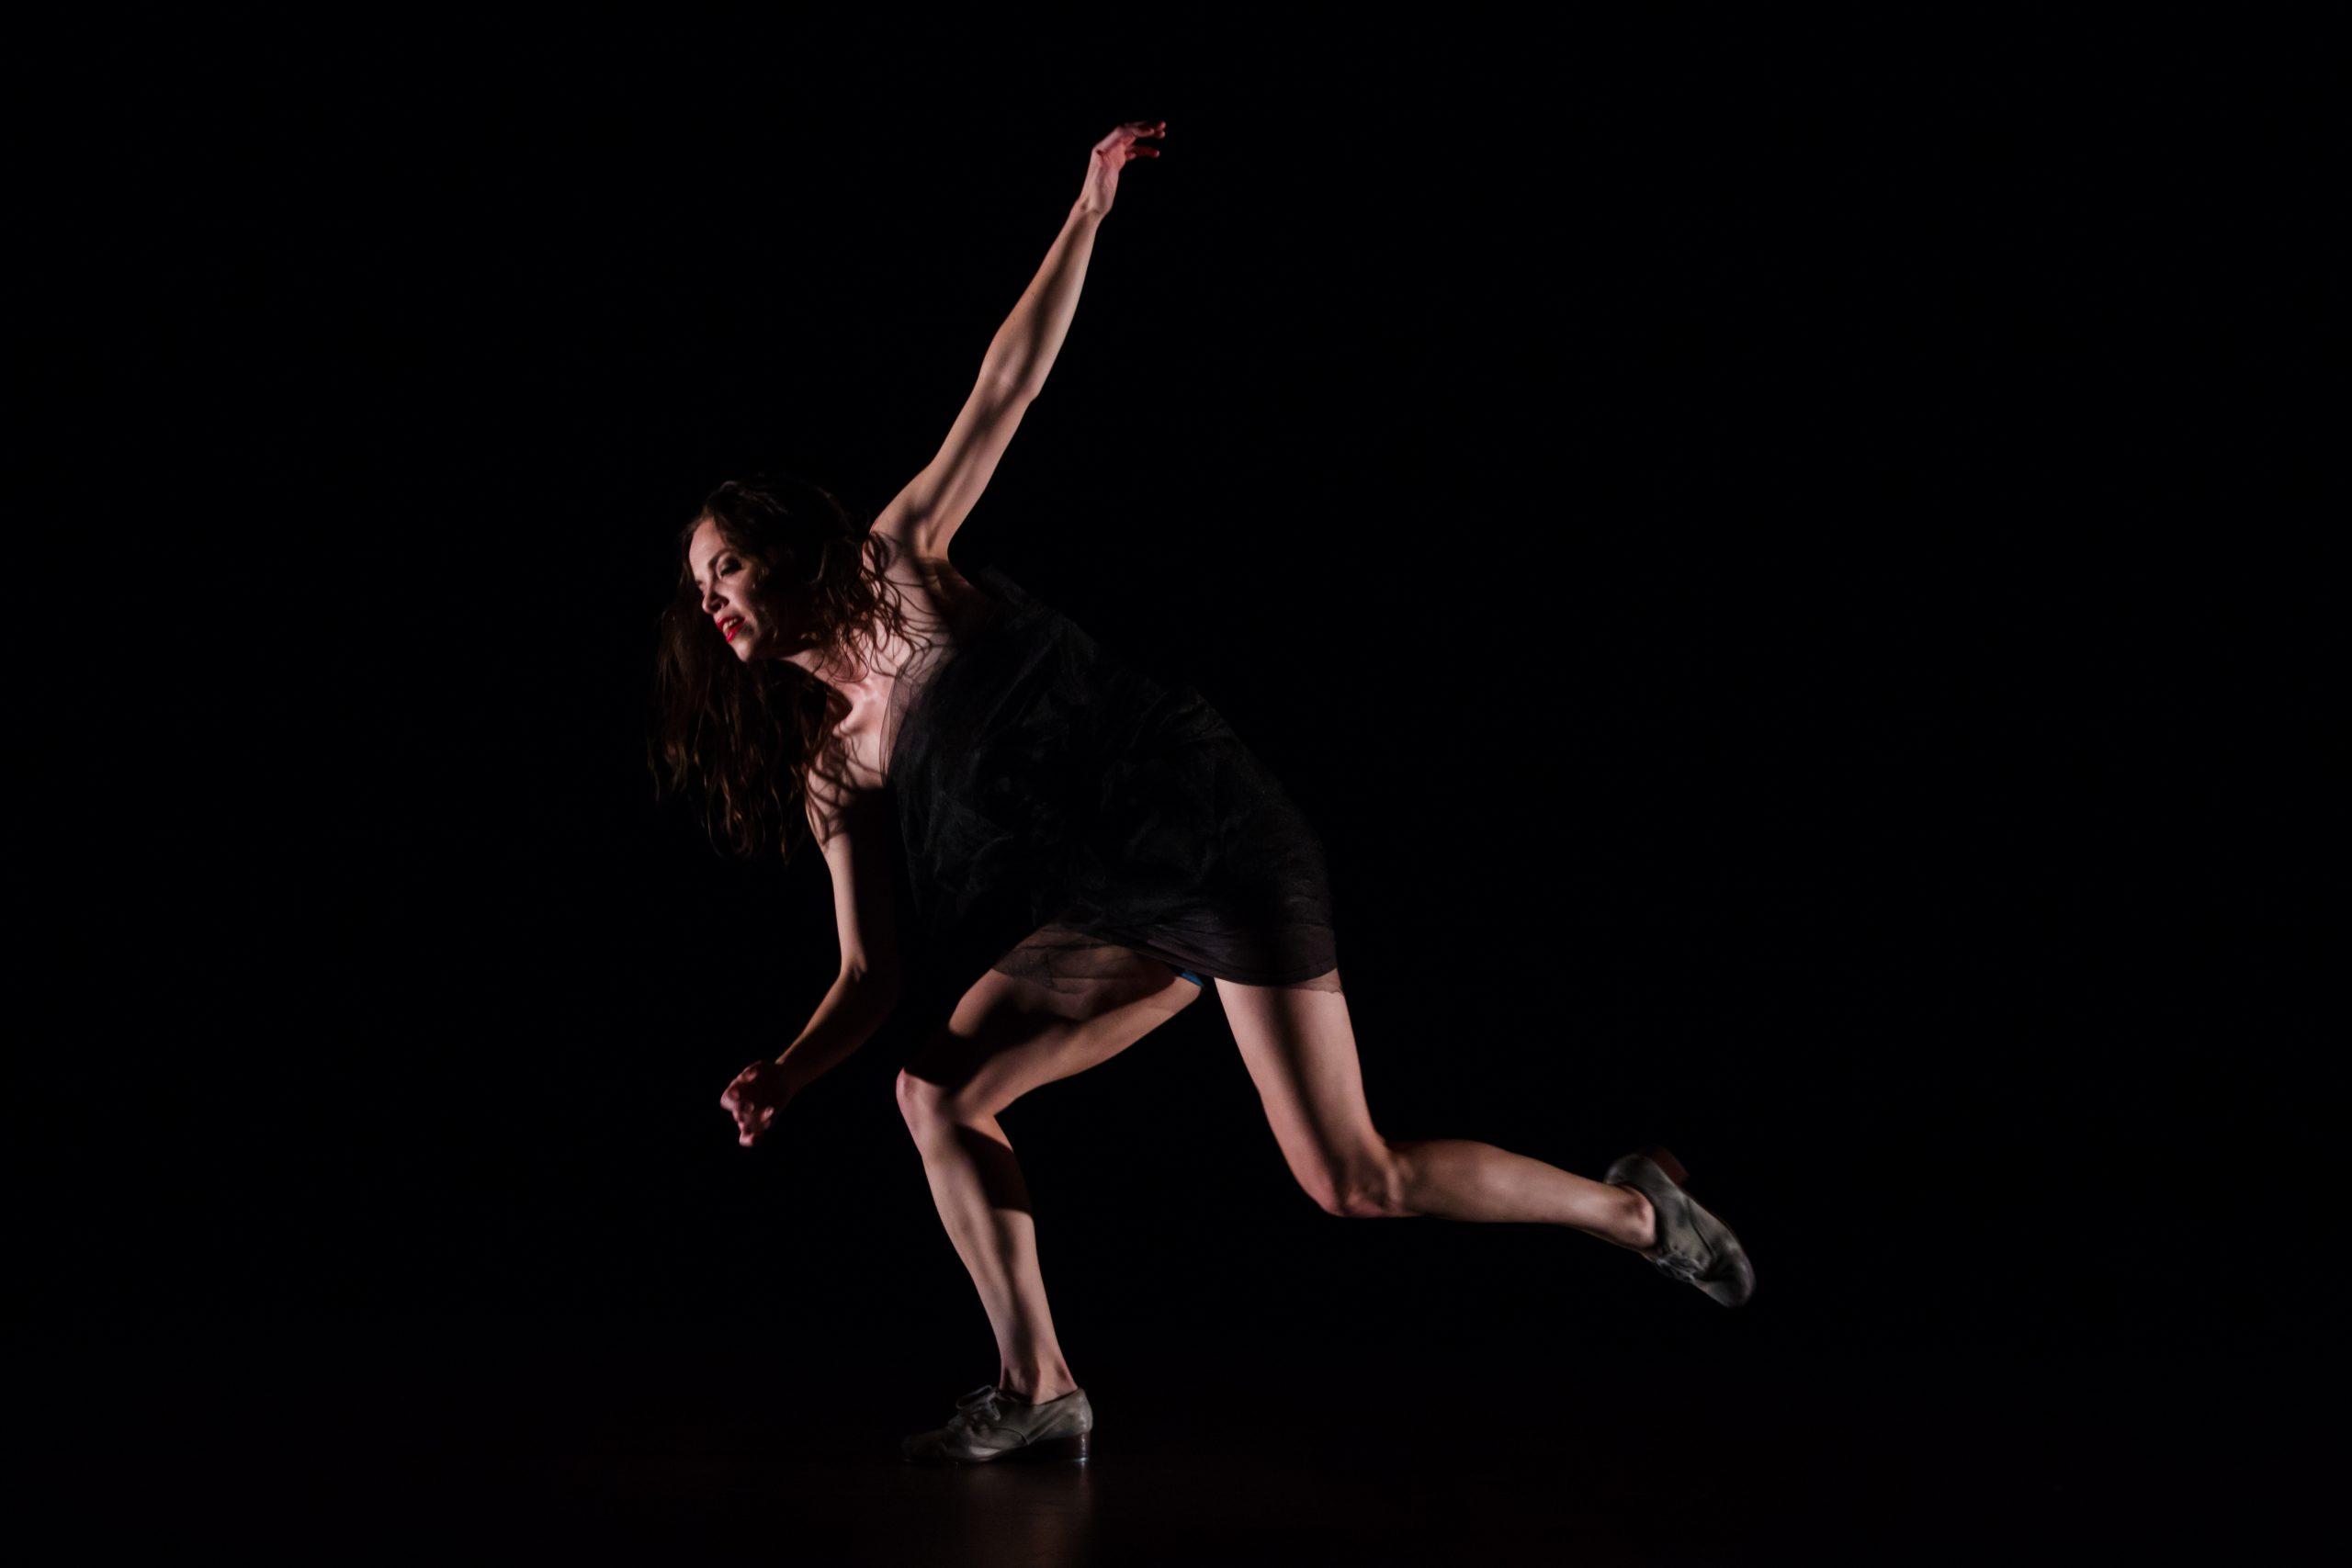 Michelle Dorrance, a white woman wearing a black leotard, tap dances on a darkly lit stage.